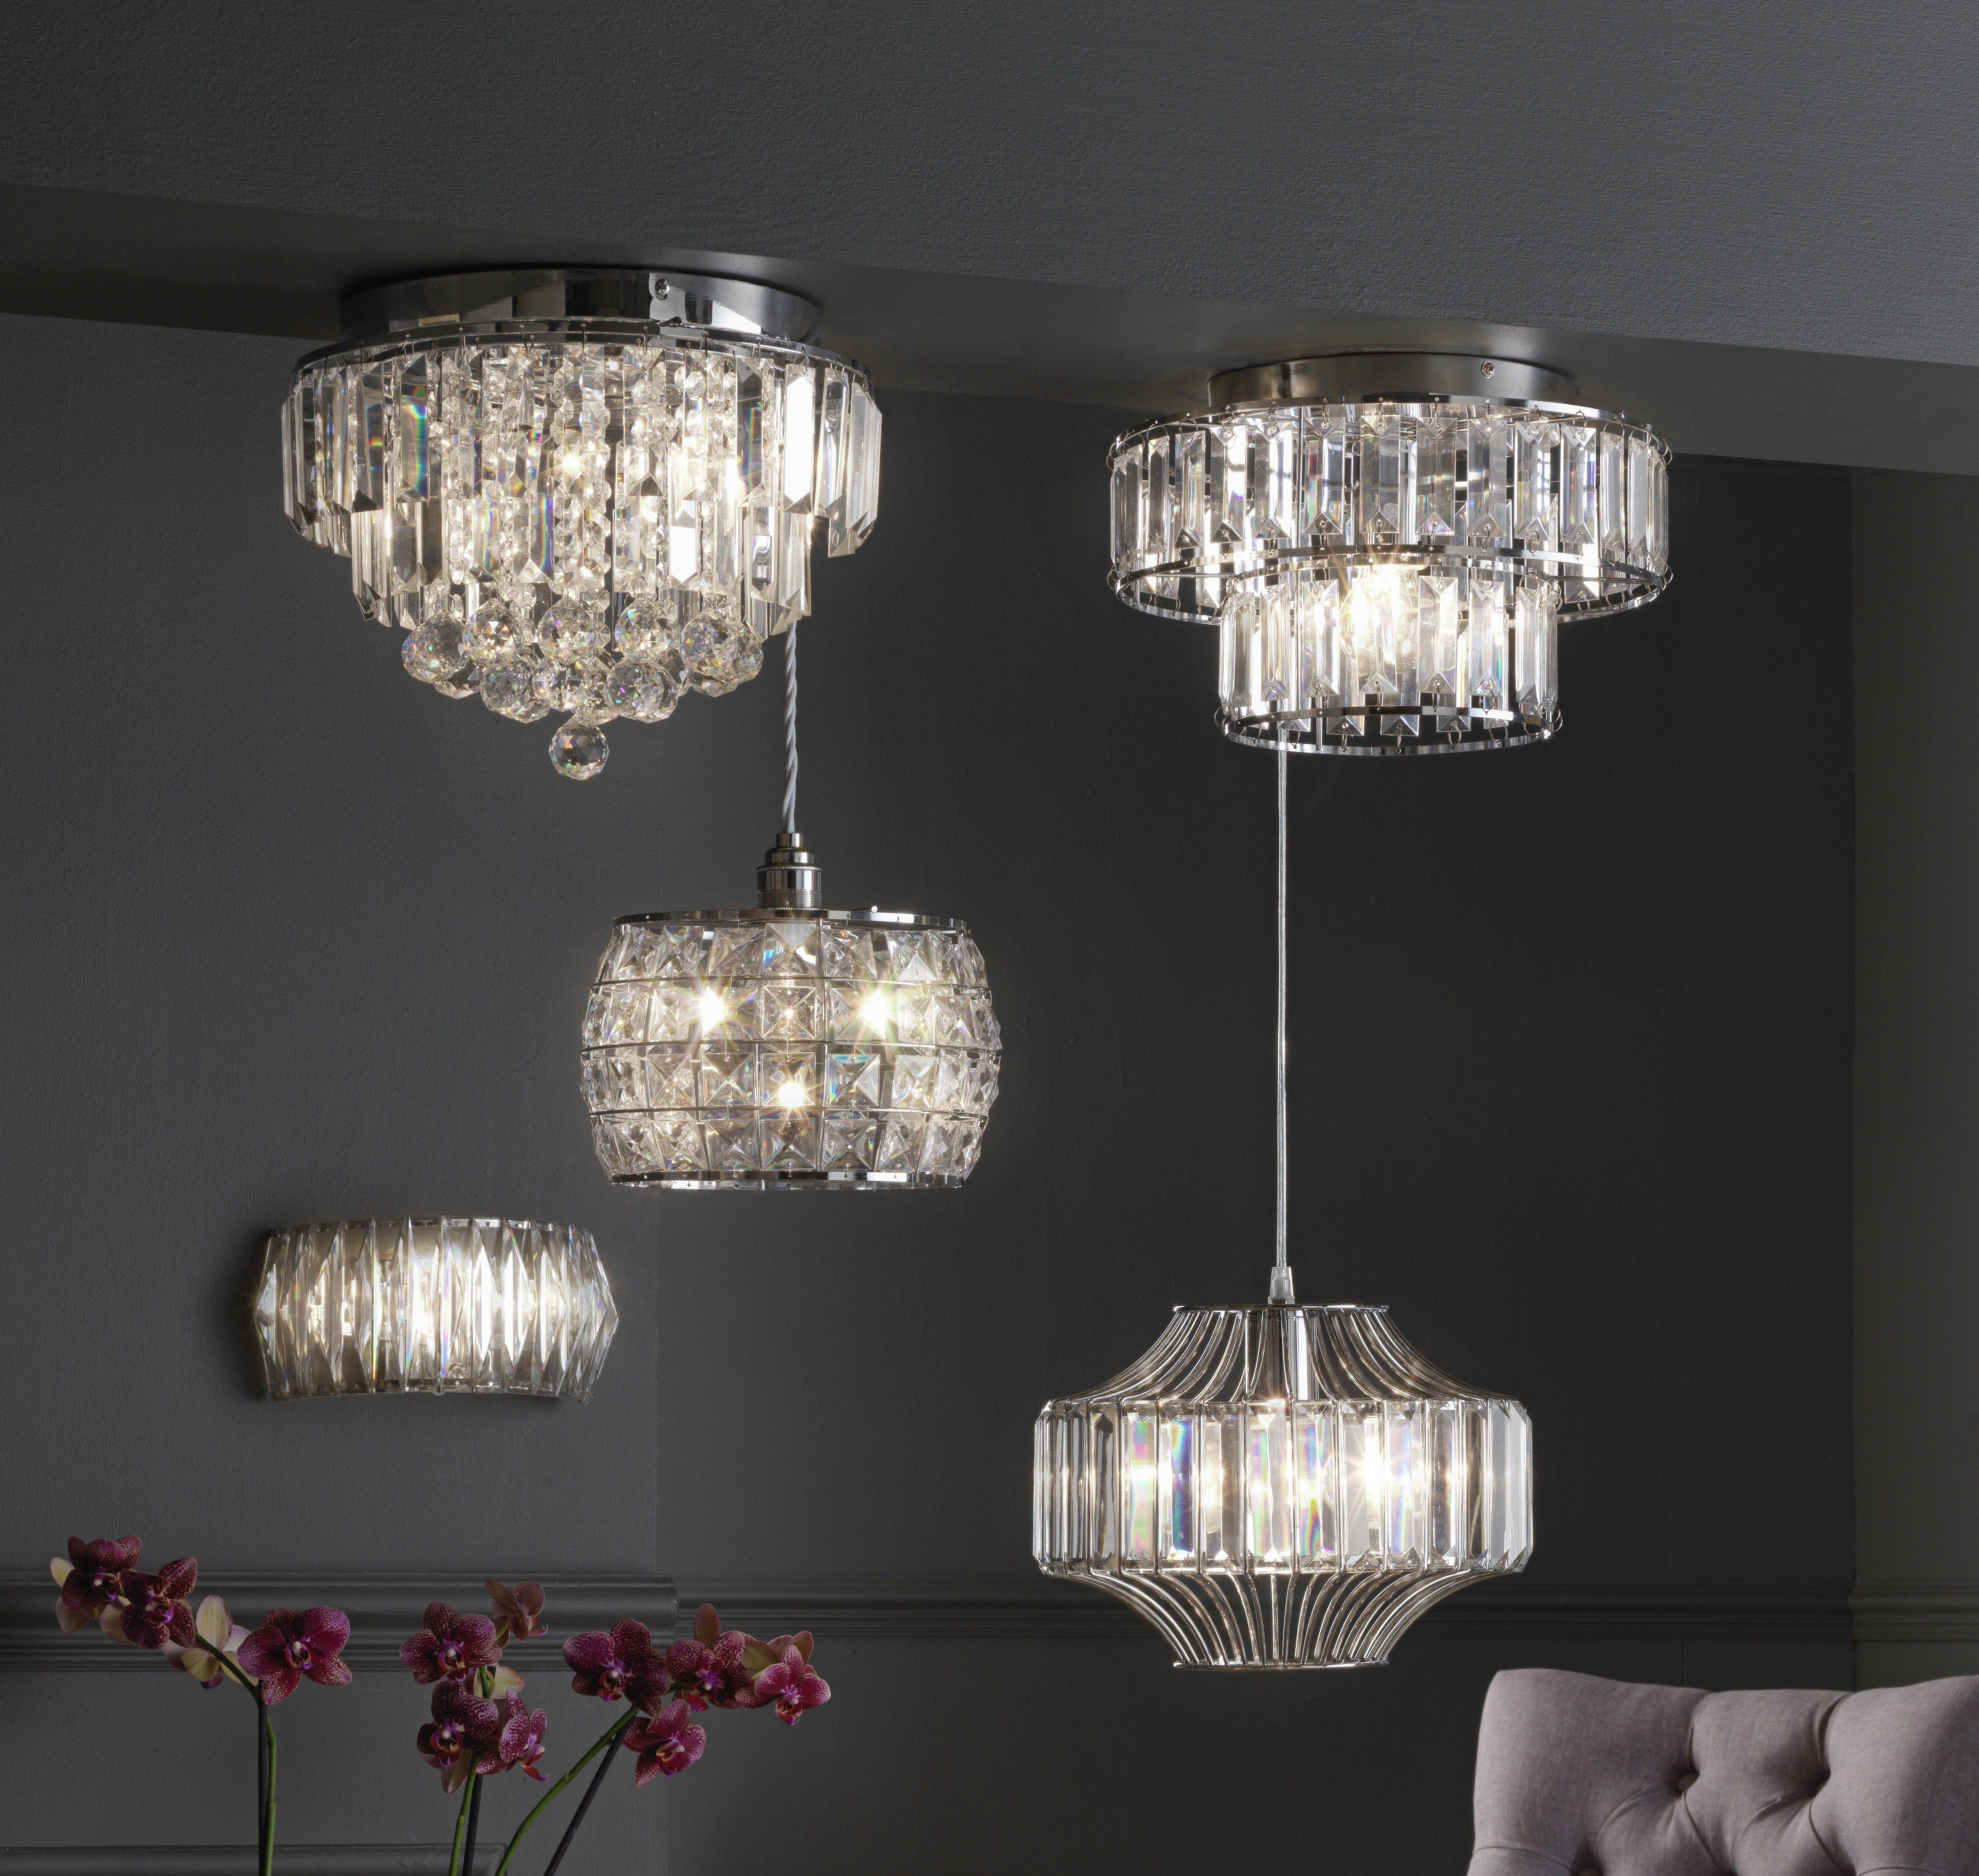 Argos Home Opulence Crystal Glass Flush Ceiling Light Reviews